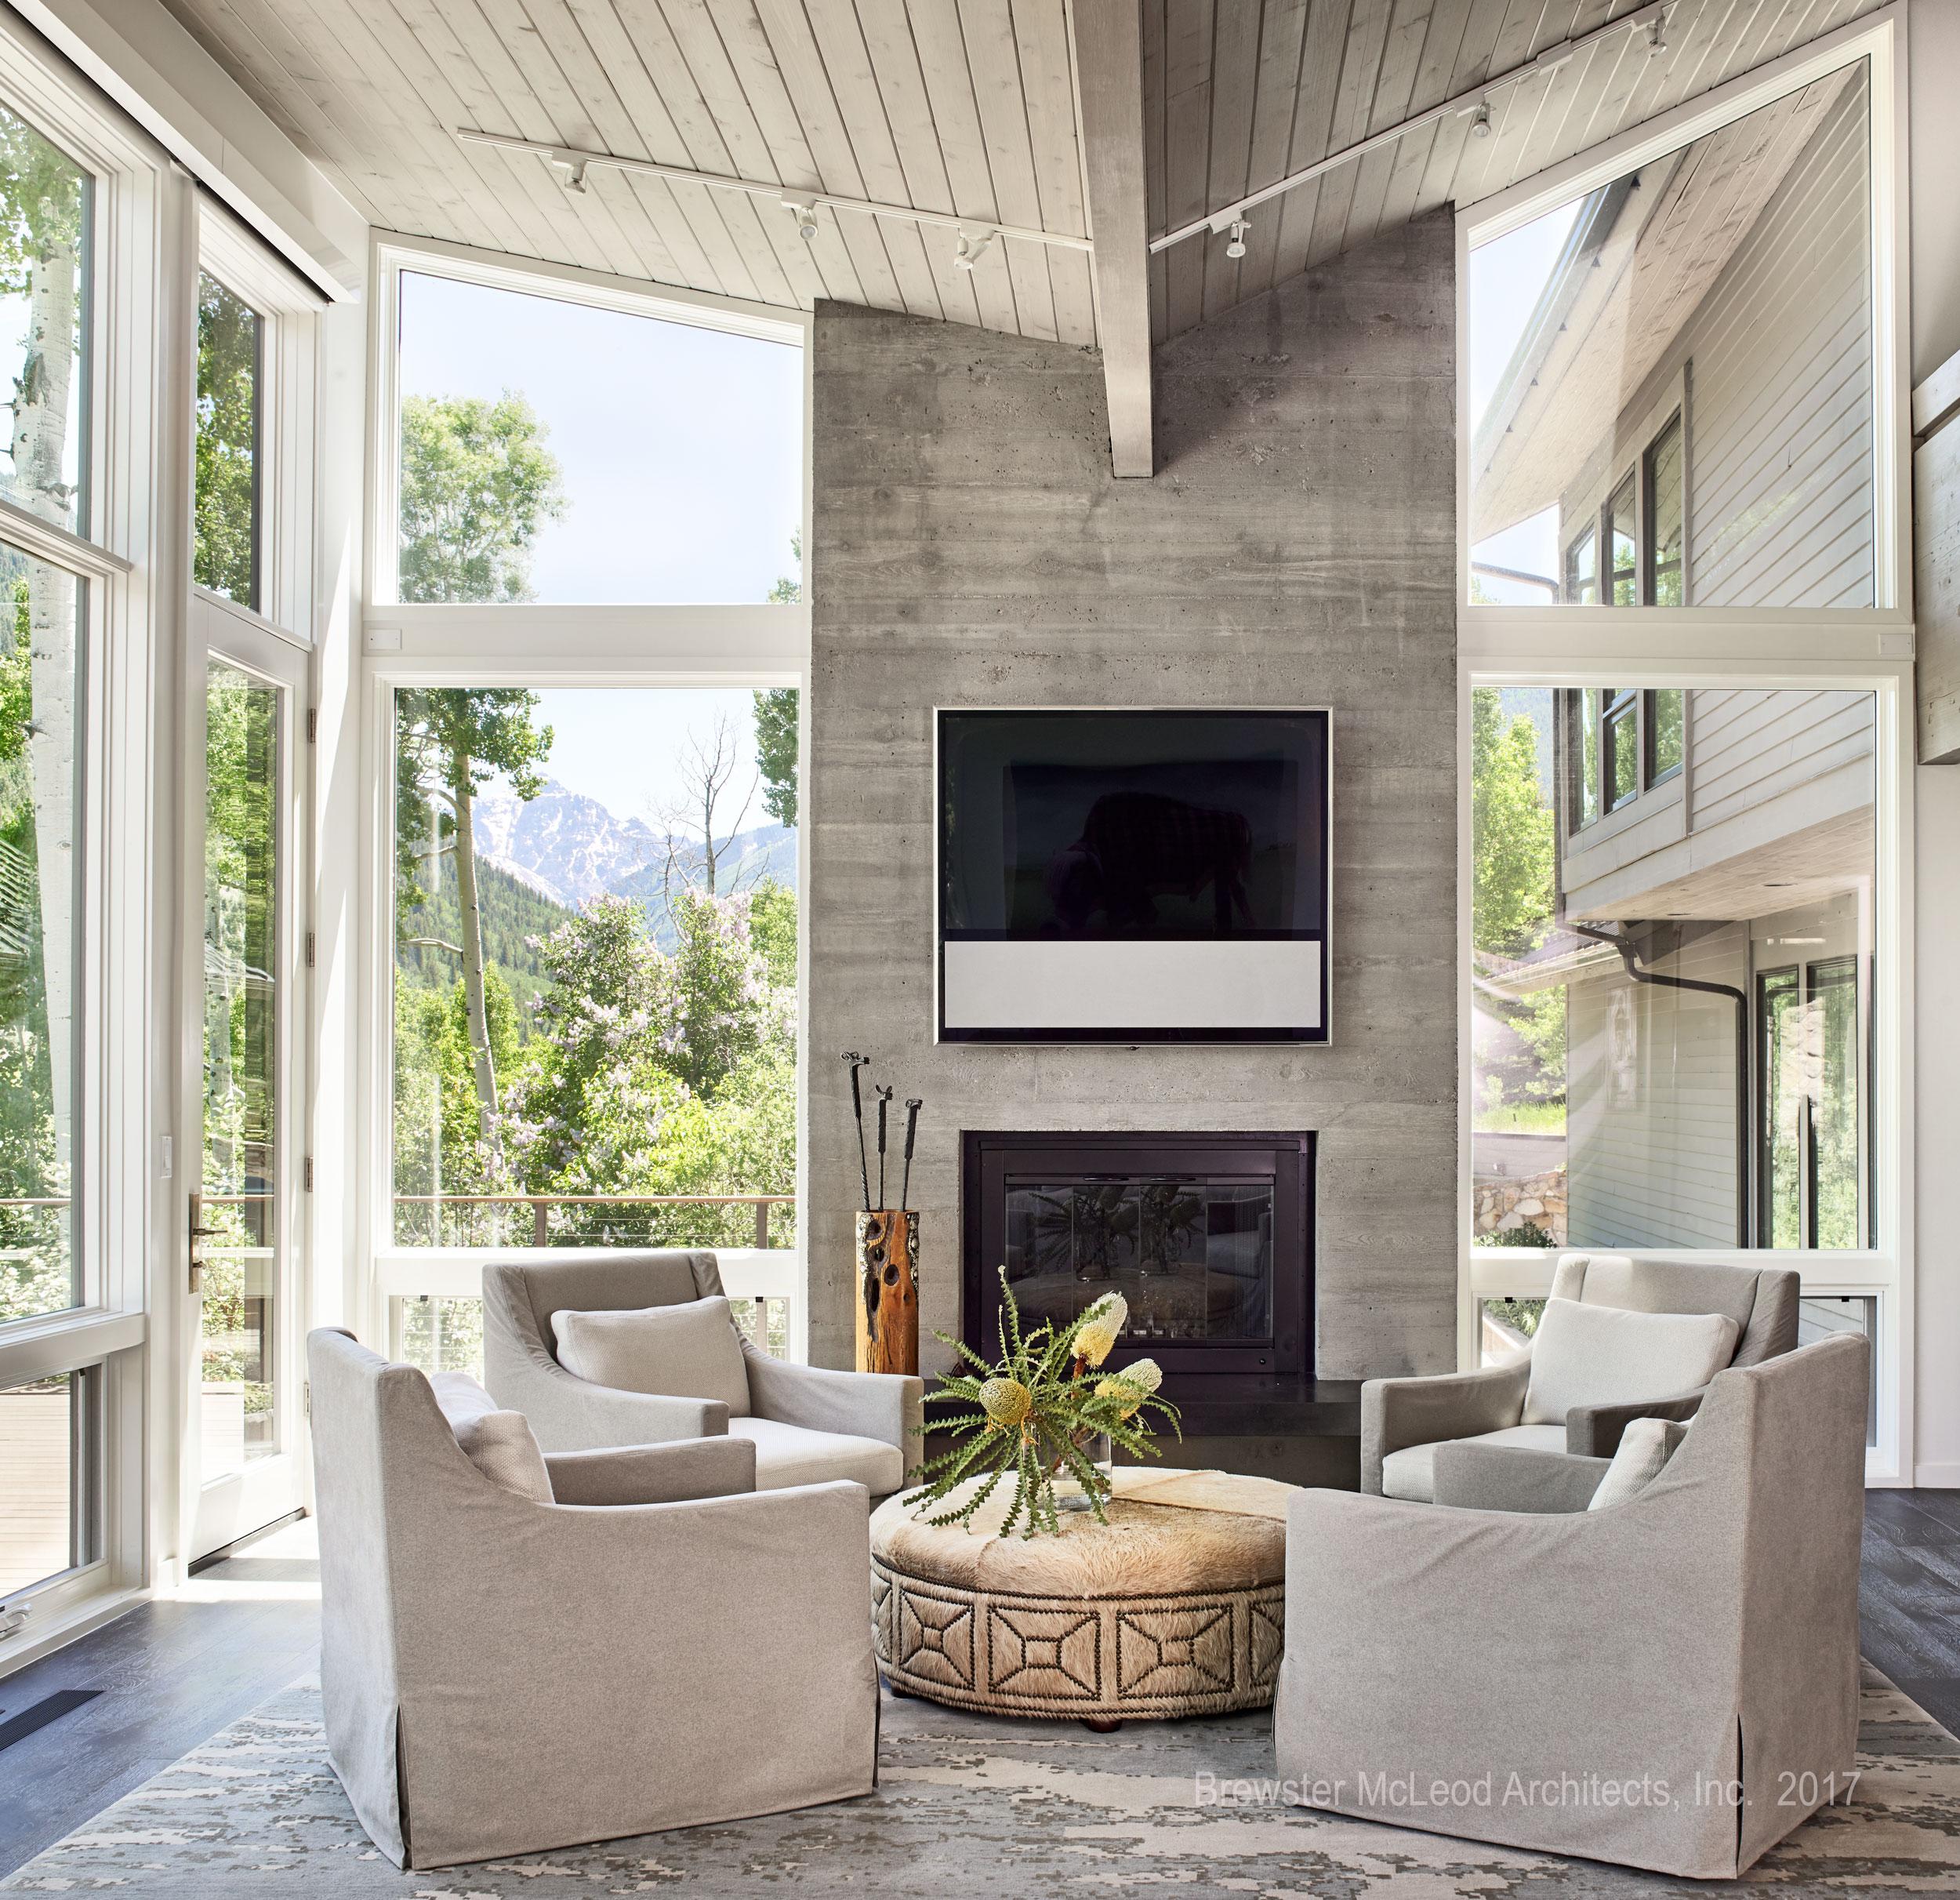 Maroon Creek Brewster McLeod Architects